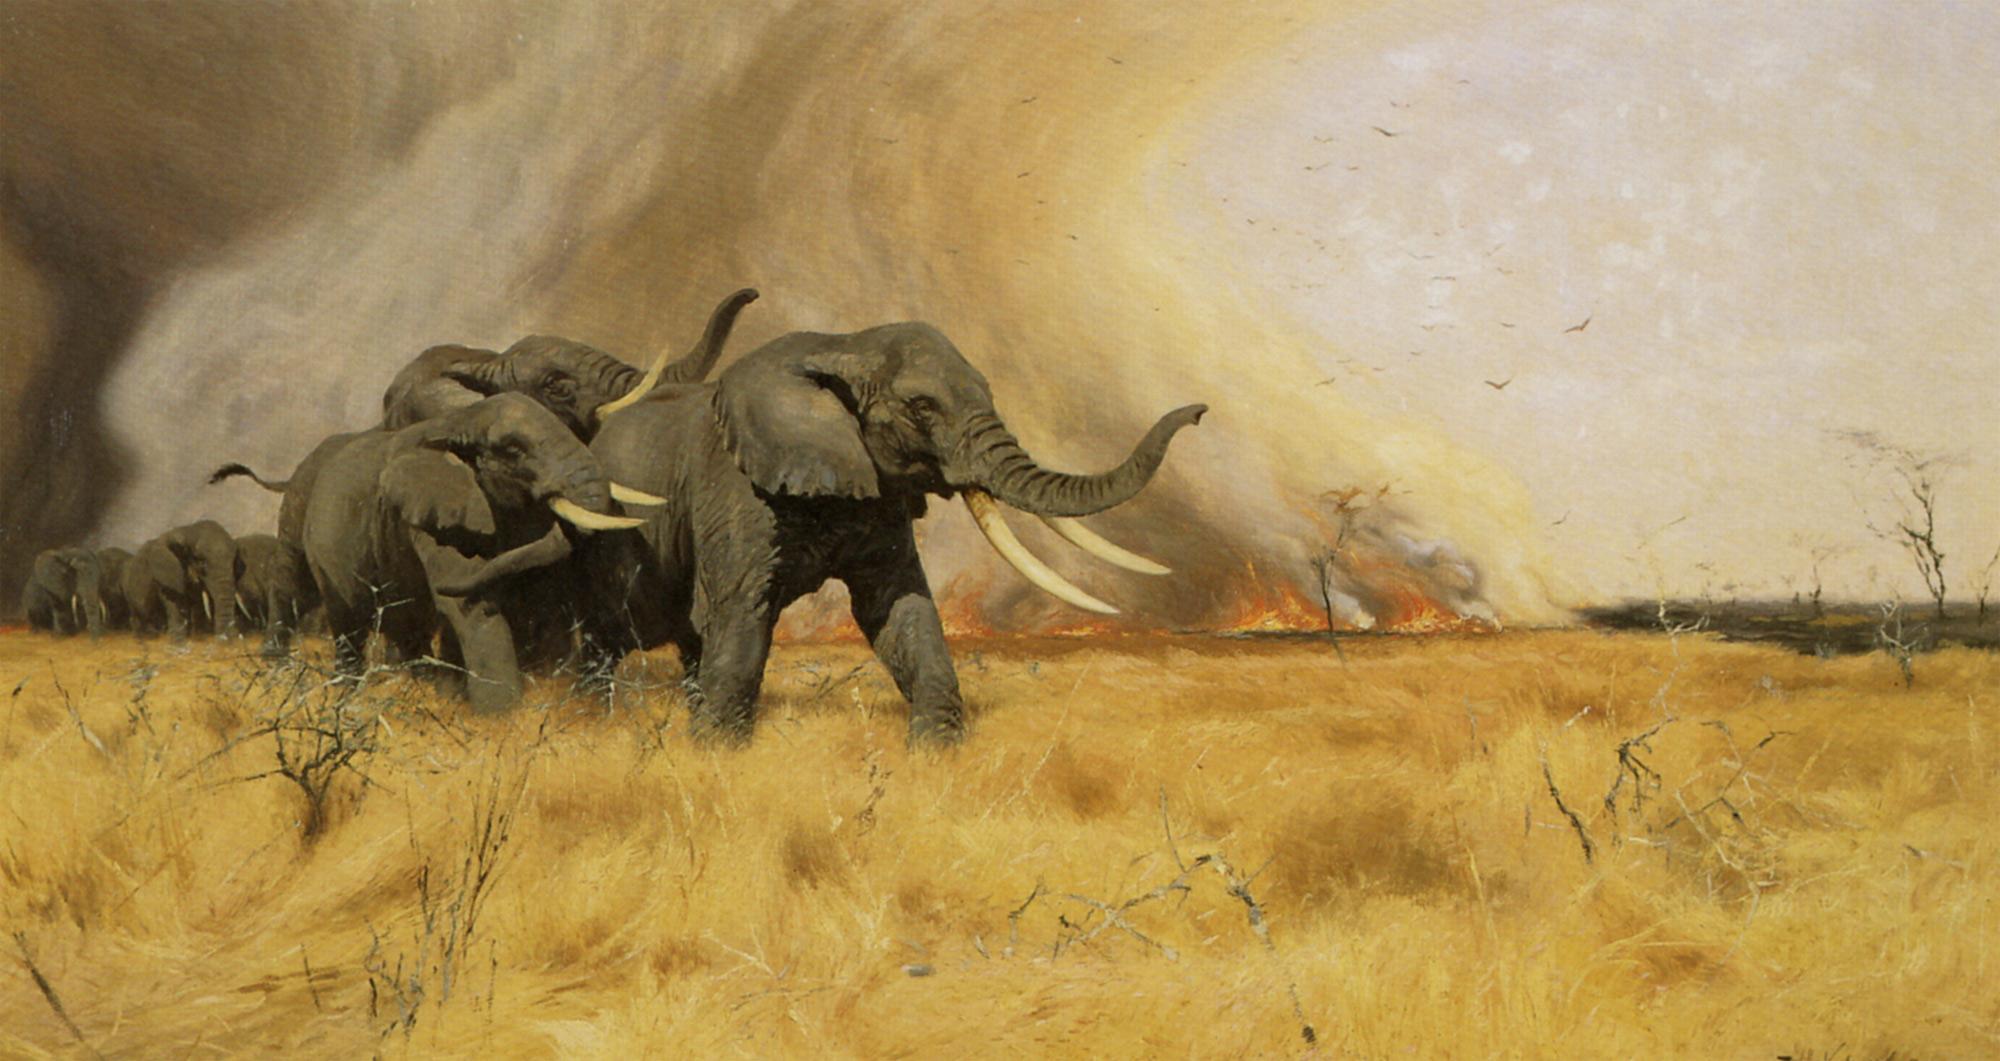 kuhnert_wilhelm_elephants_moving_before_a_veldt_fire_1912_oil_on_canvas-huge